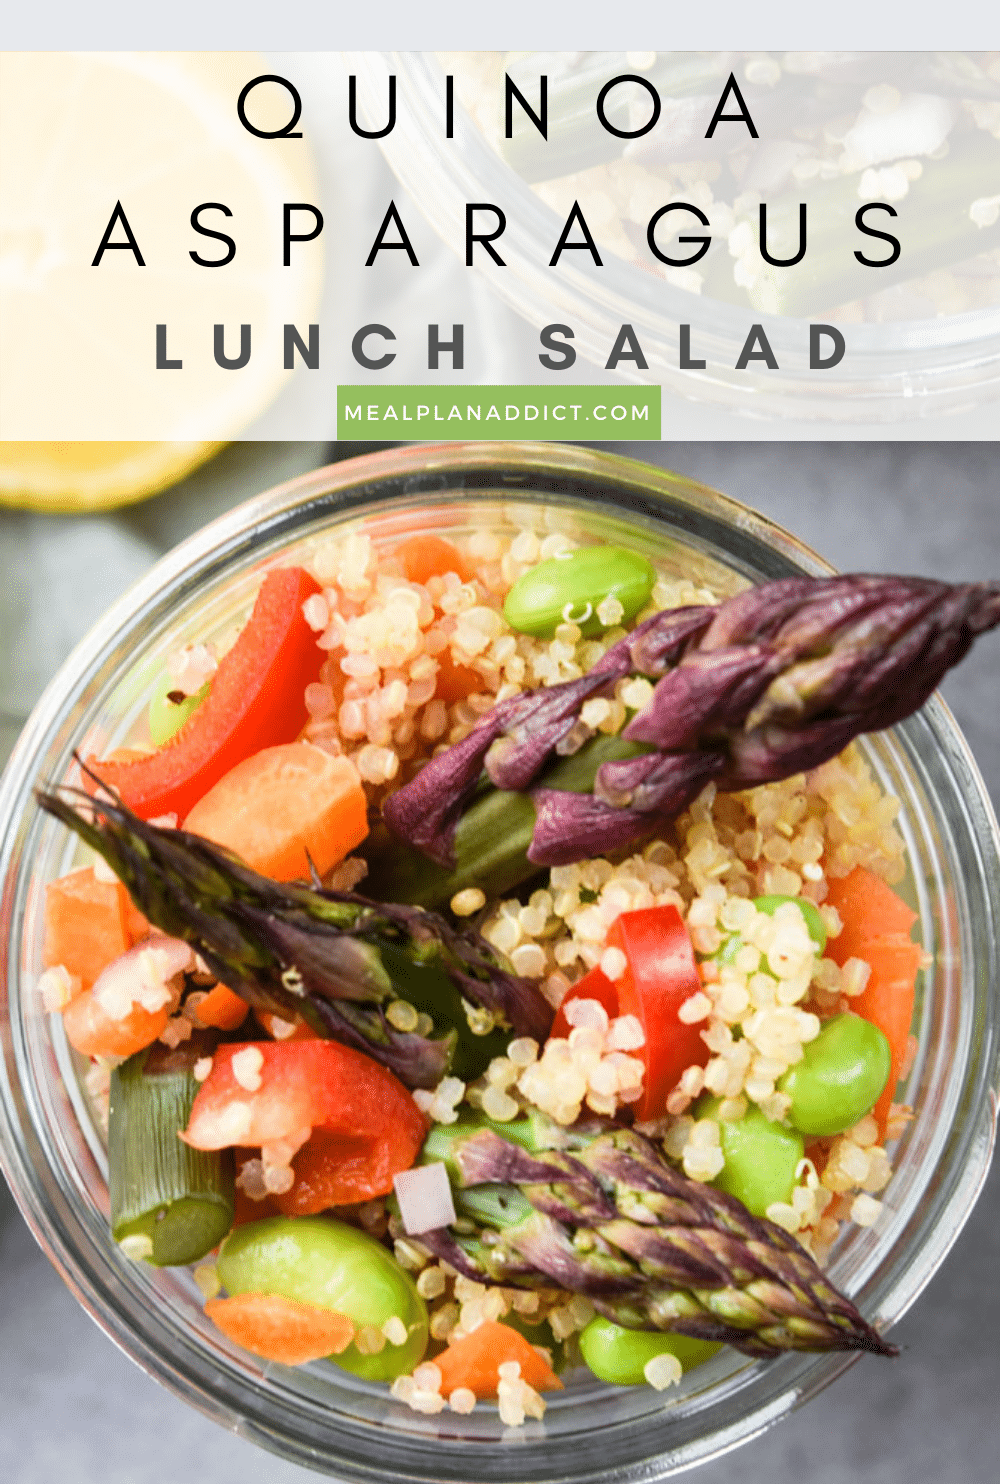 Quinoa asparagus salad pin for Pinterest